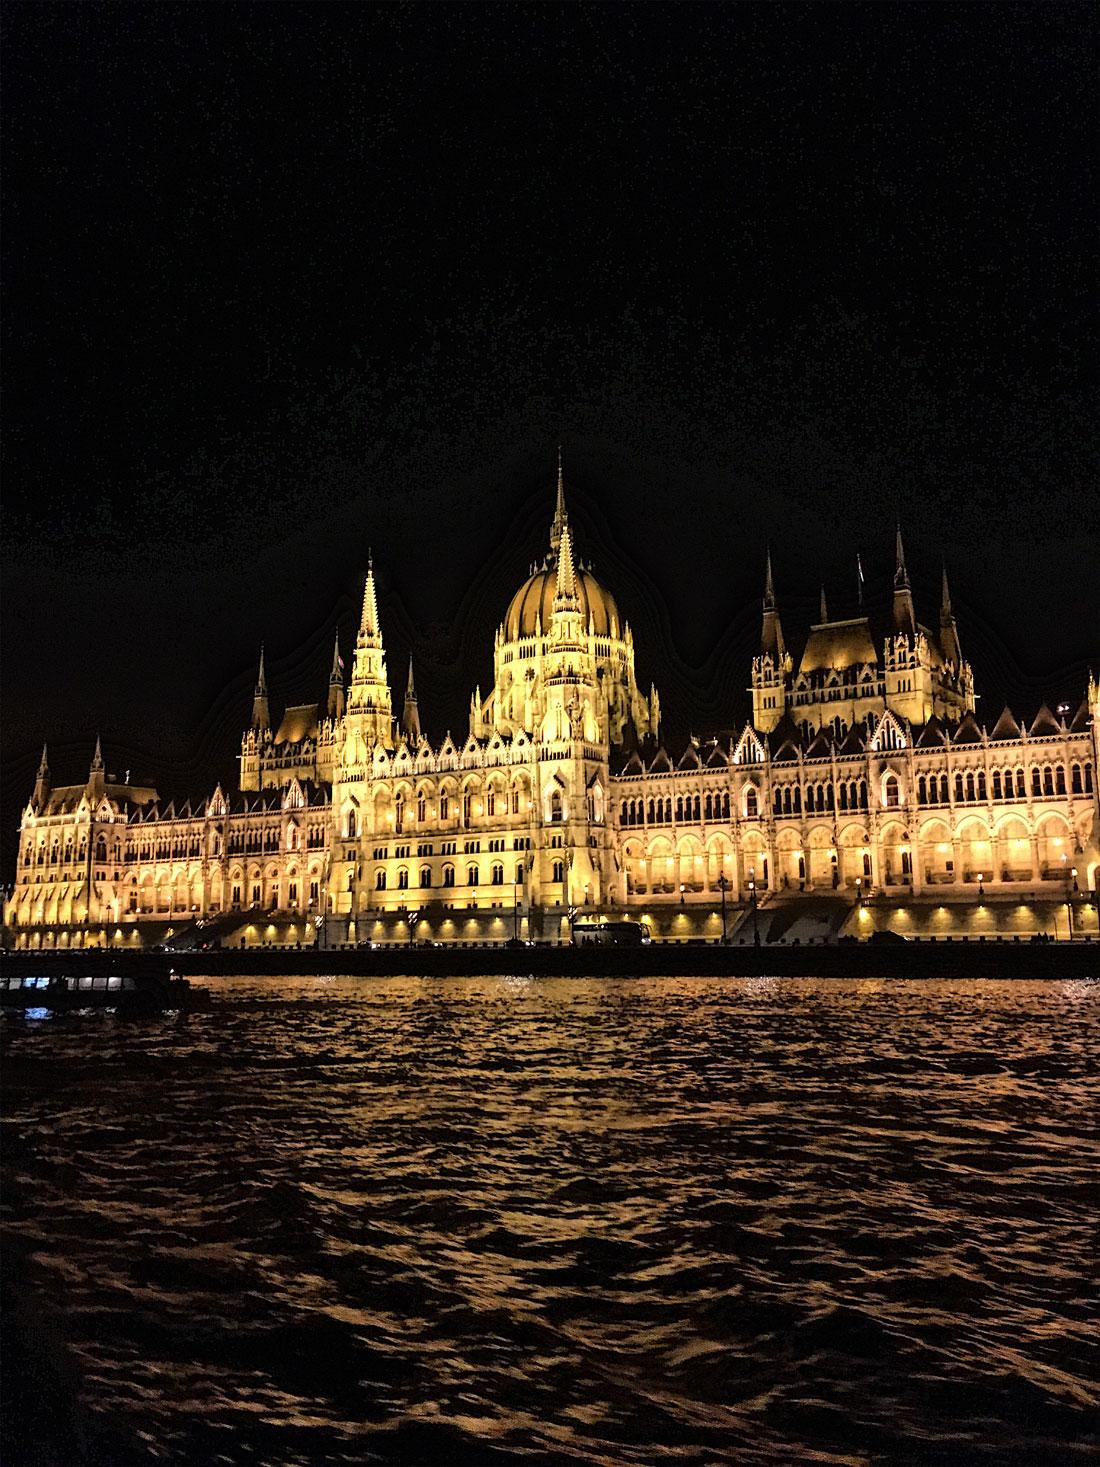 budapest_parliament1.jpg